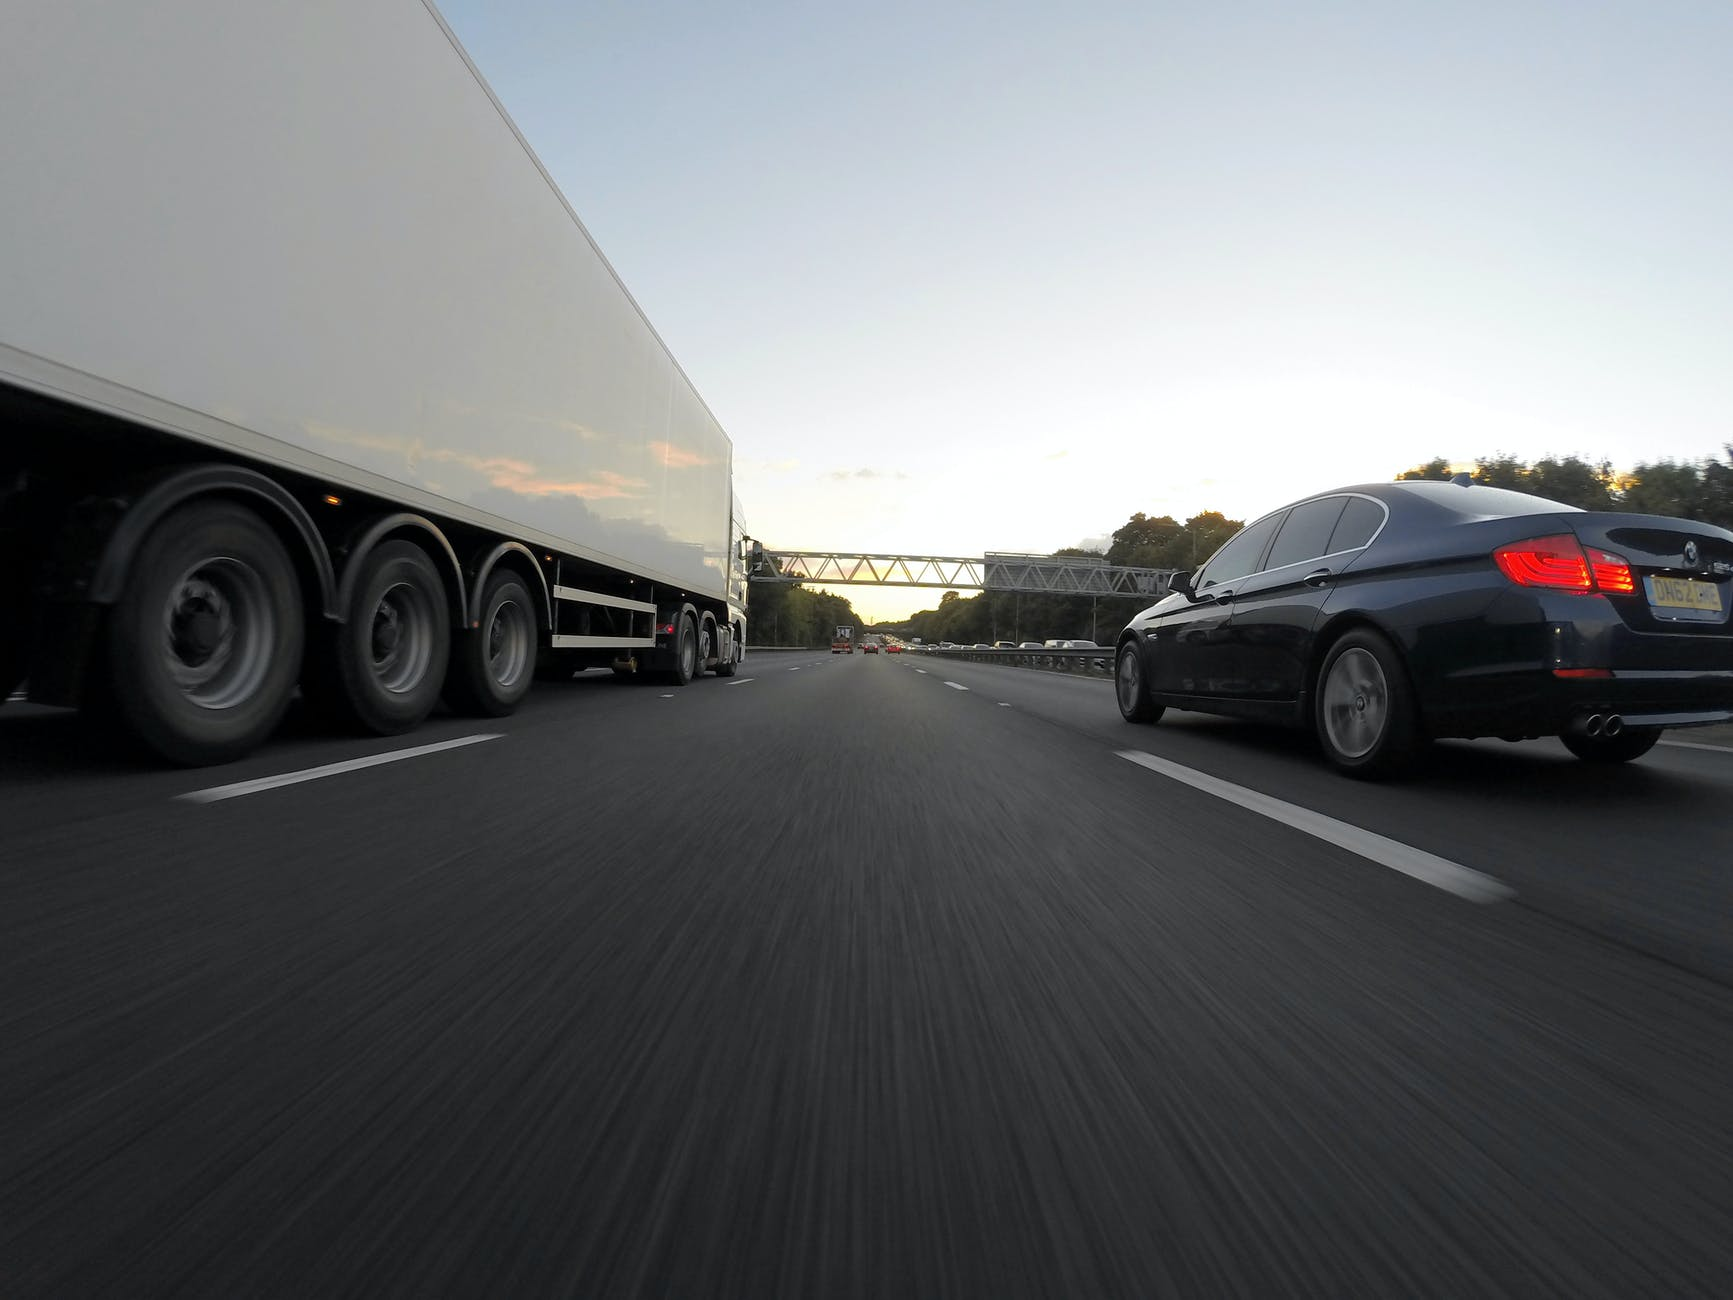 covered car transport